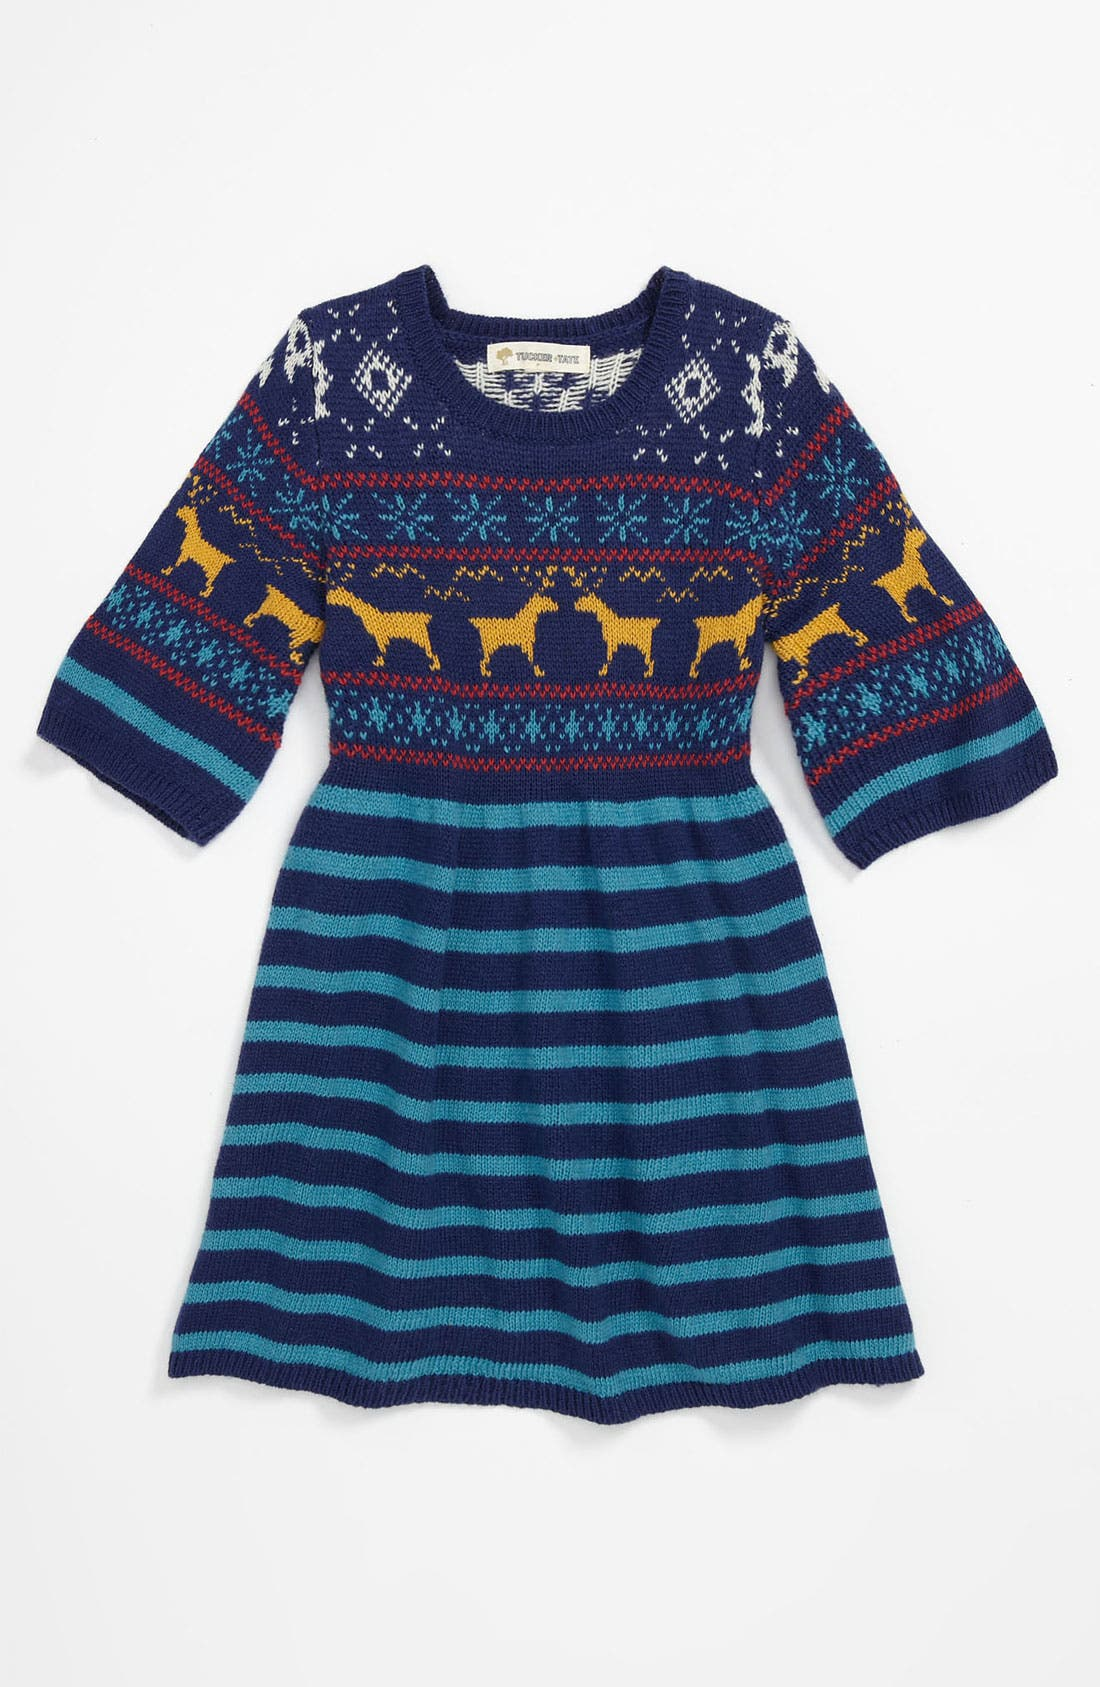 Main Image - Tucker + Tate 'Faye' Sweater Dress (Toddler)